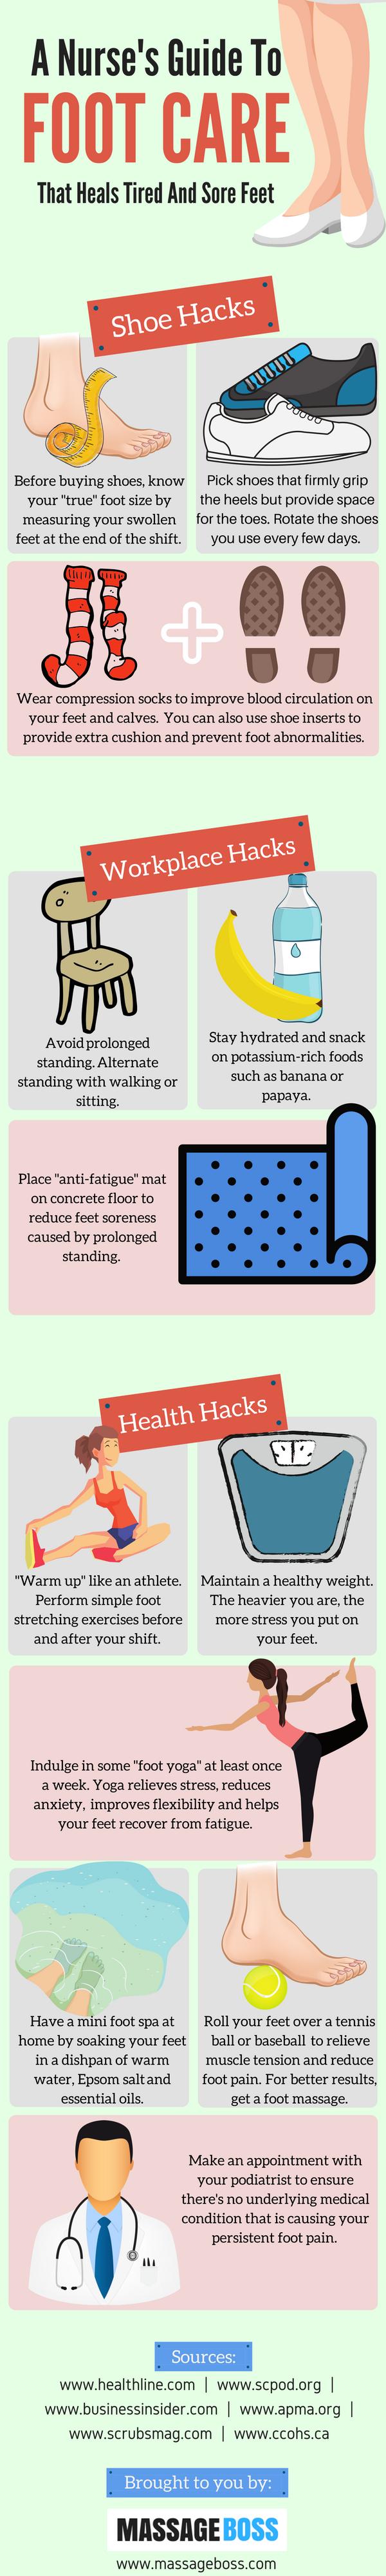 foot care for nurses